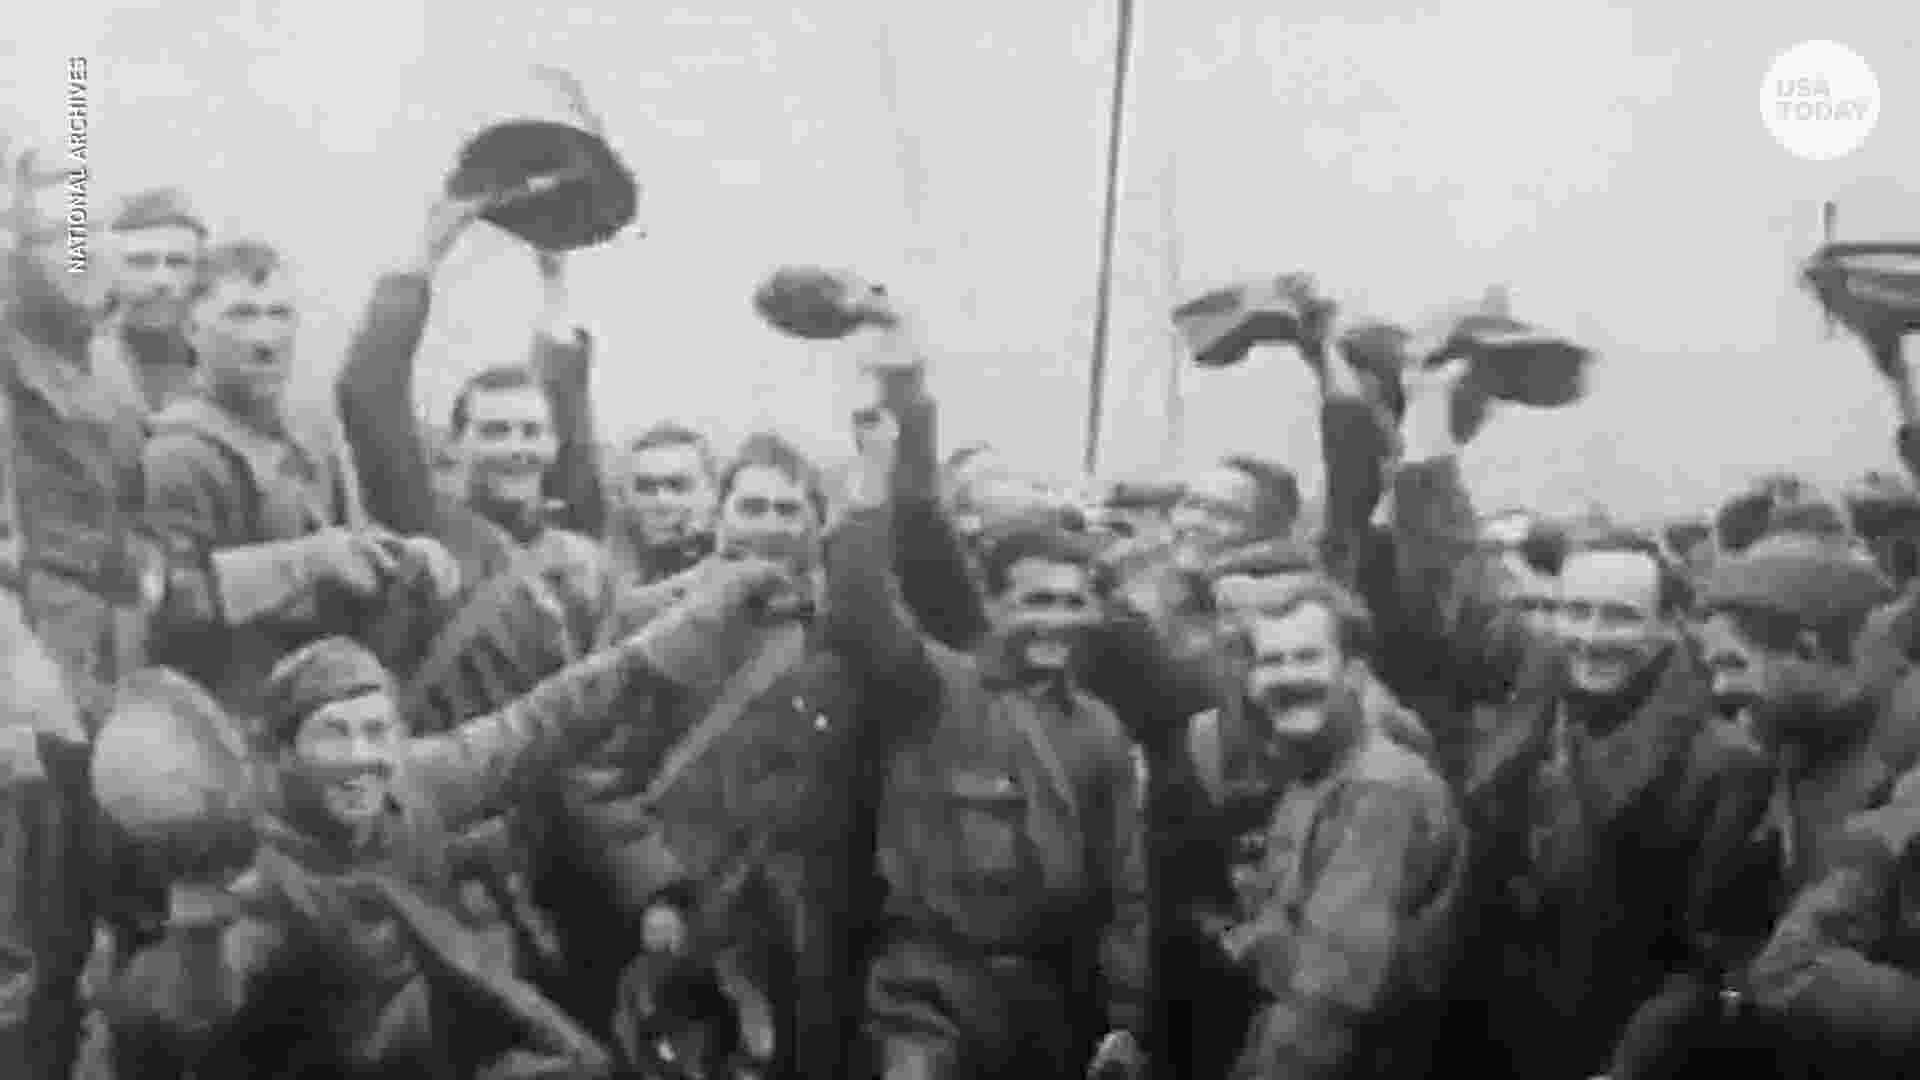 Veterans Day 100th anniversary marks enduring 'sacrifice'